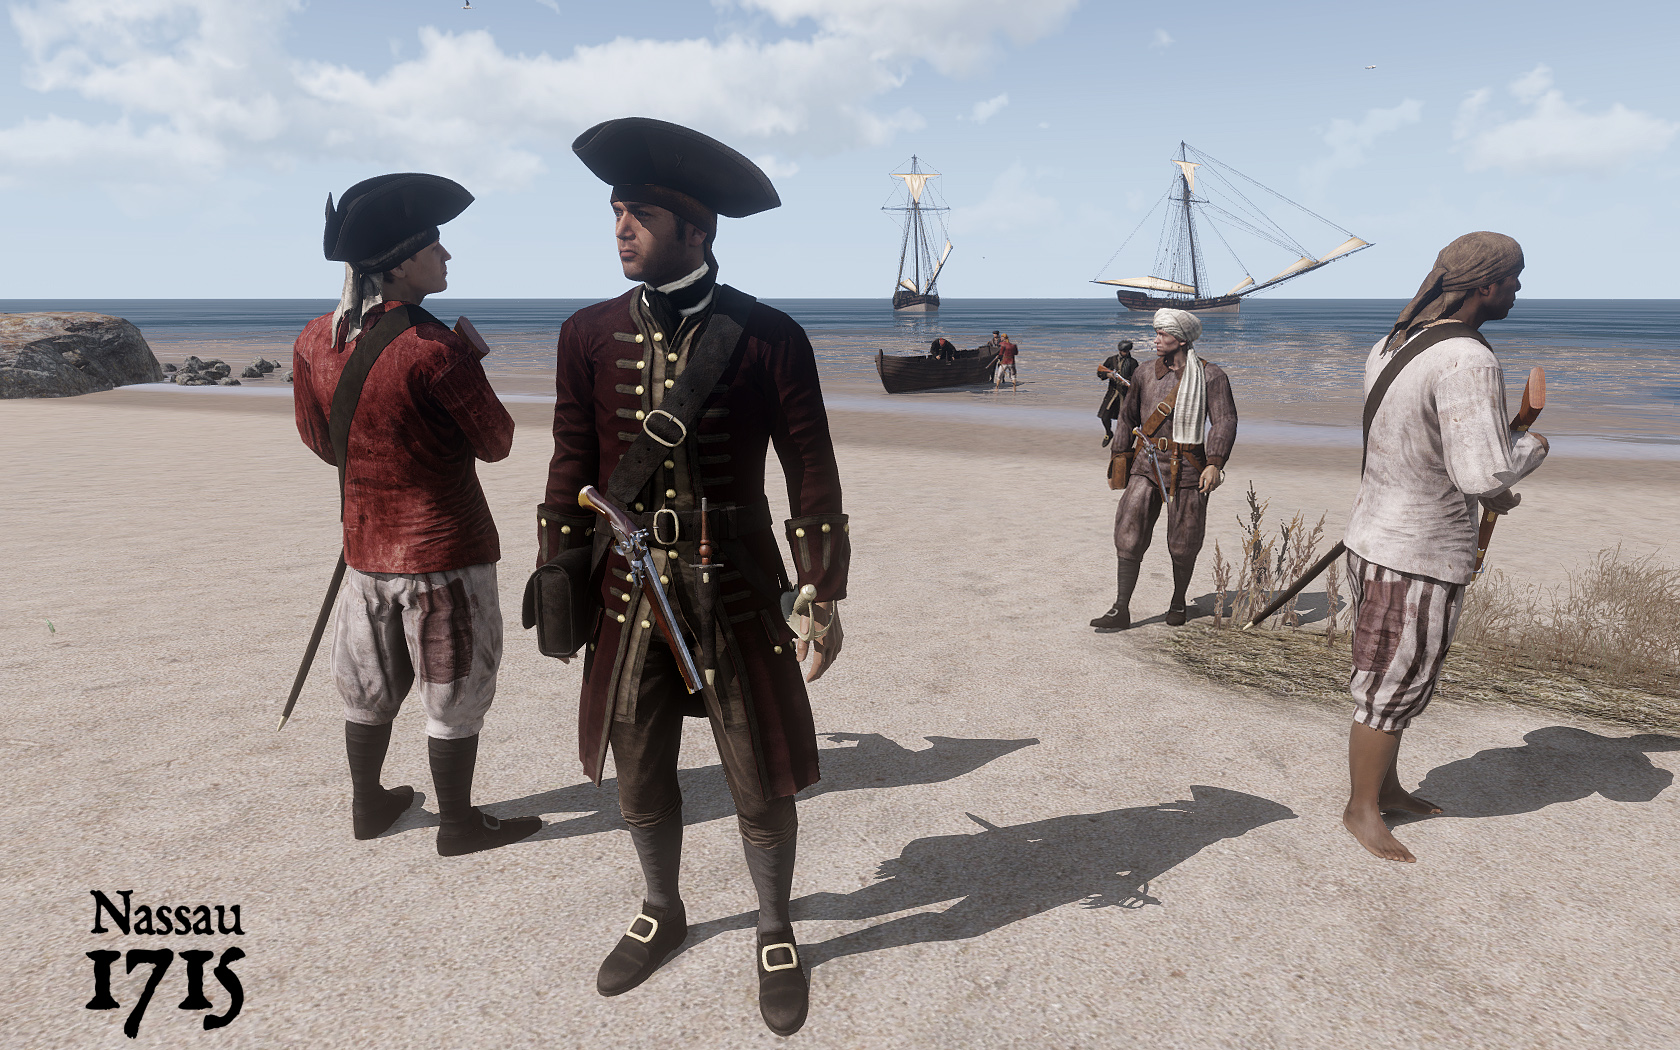 Nassau 1715 - Arma 3 mod   PiratesAhoy!